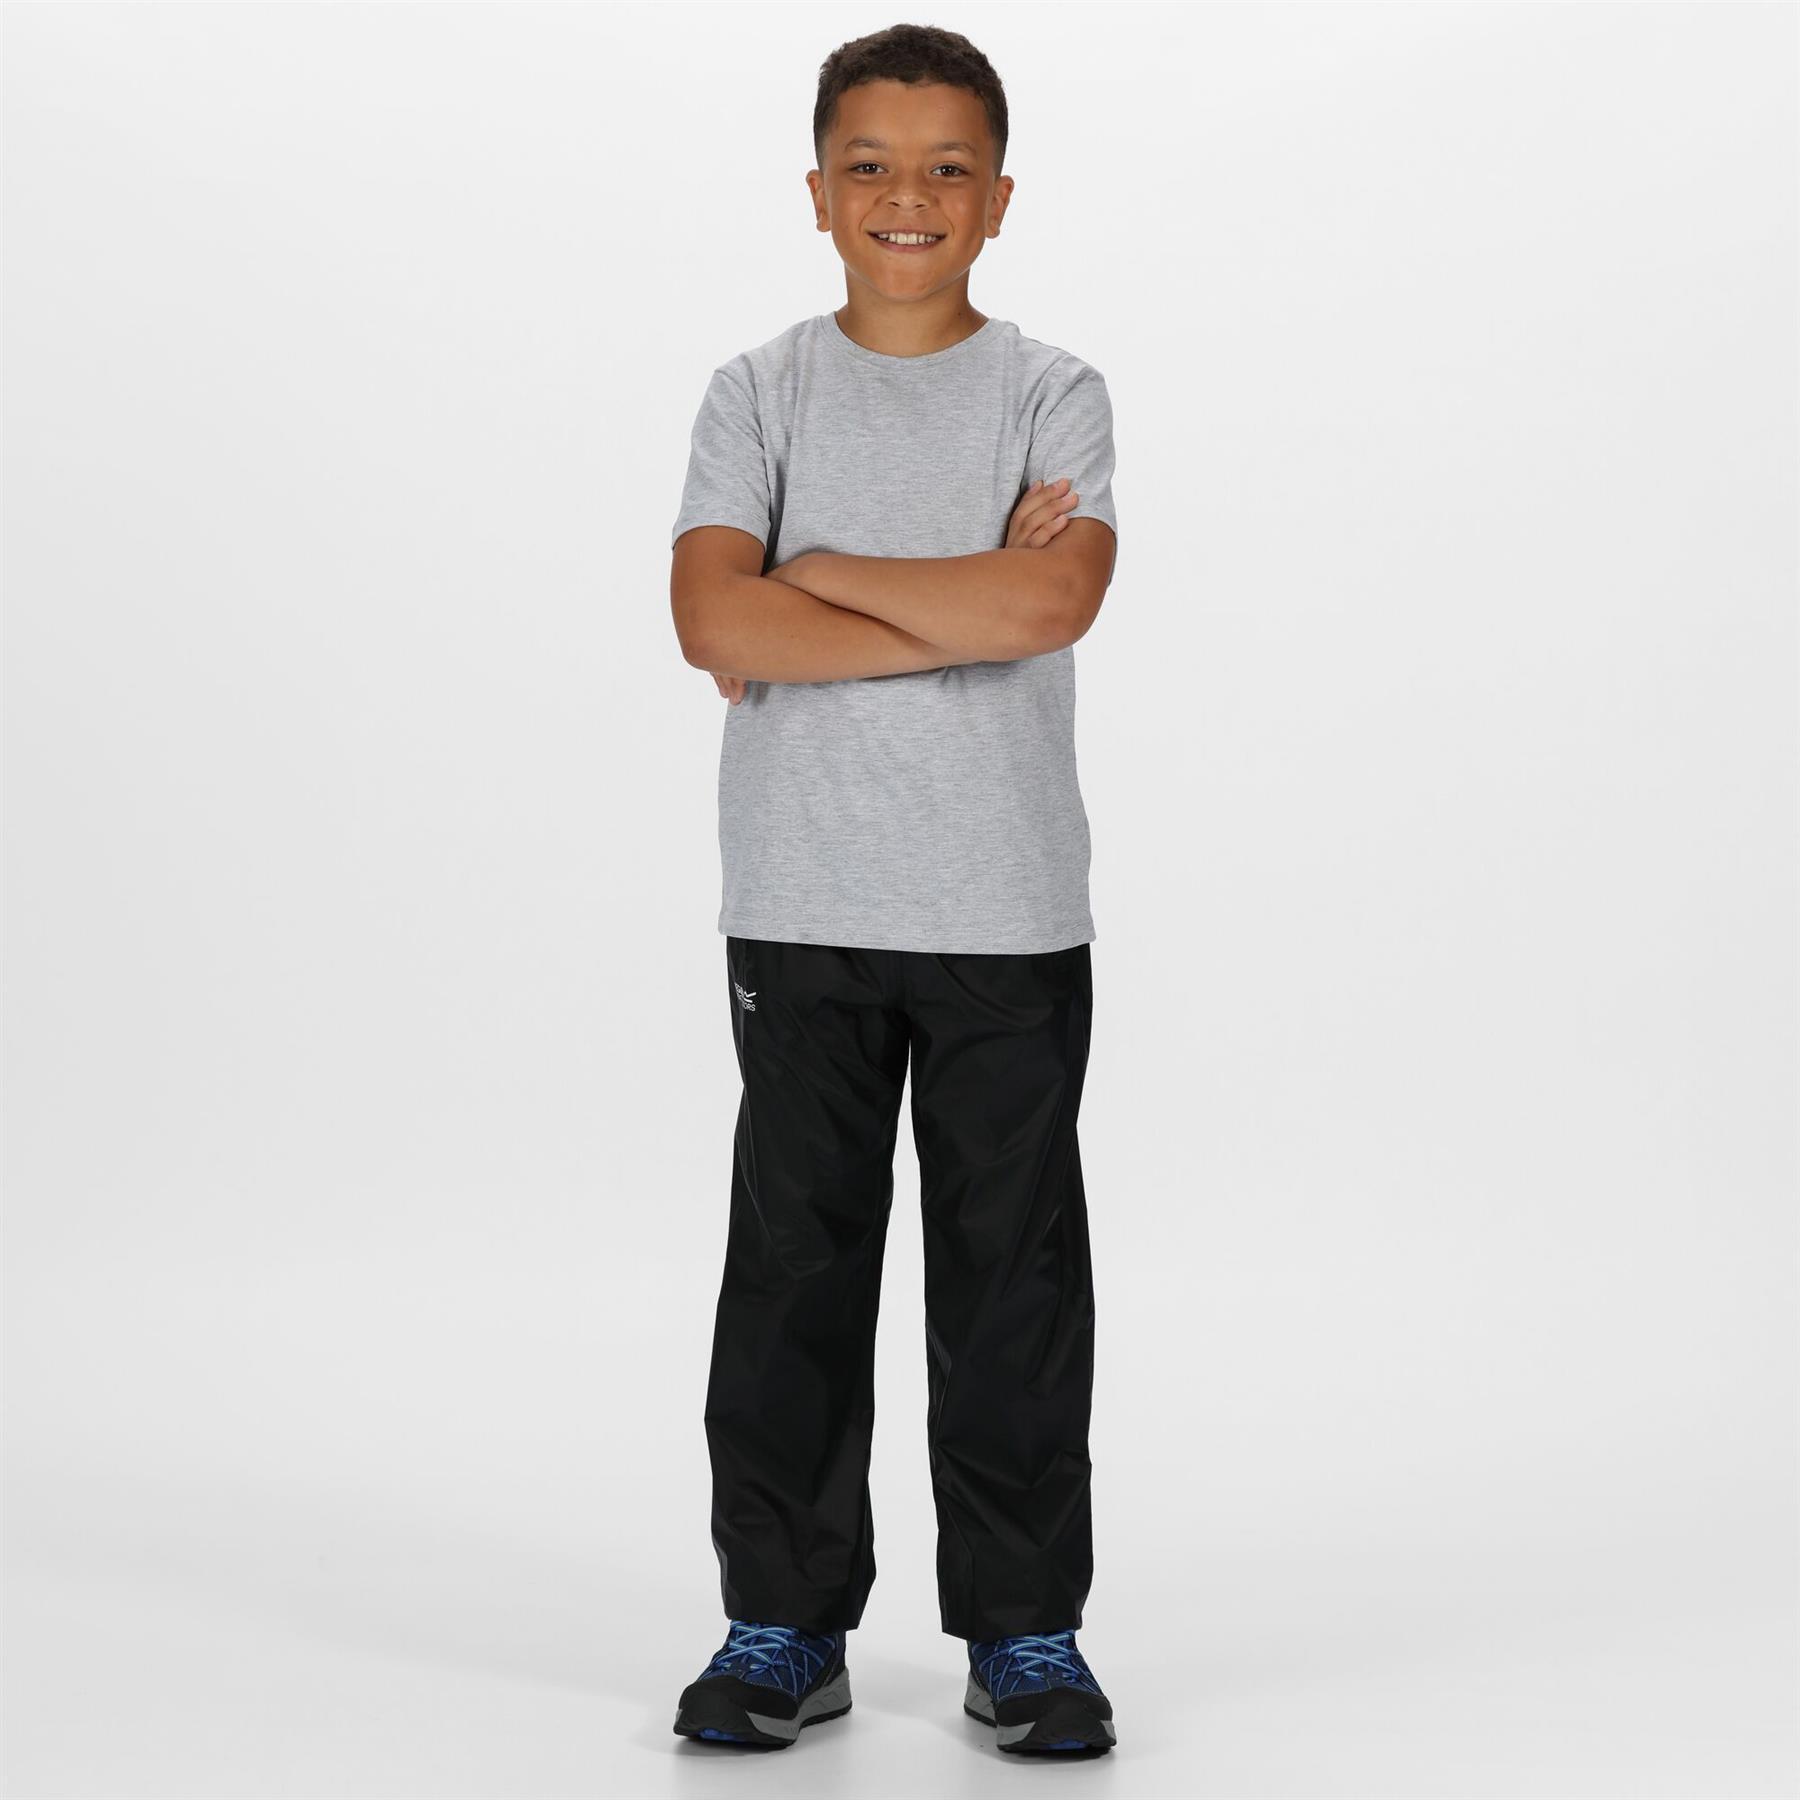 miniatuur 5 - Regatta Kids Pack It Waterproof Packable Overtrousers Boys Girls Trousers